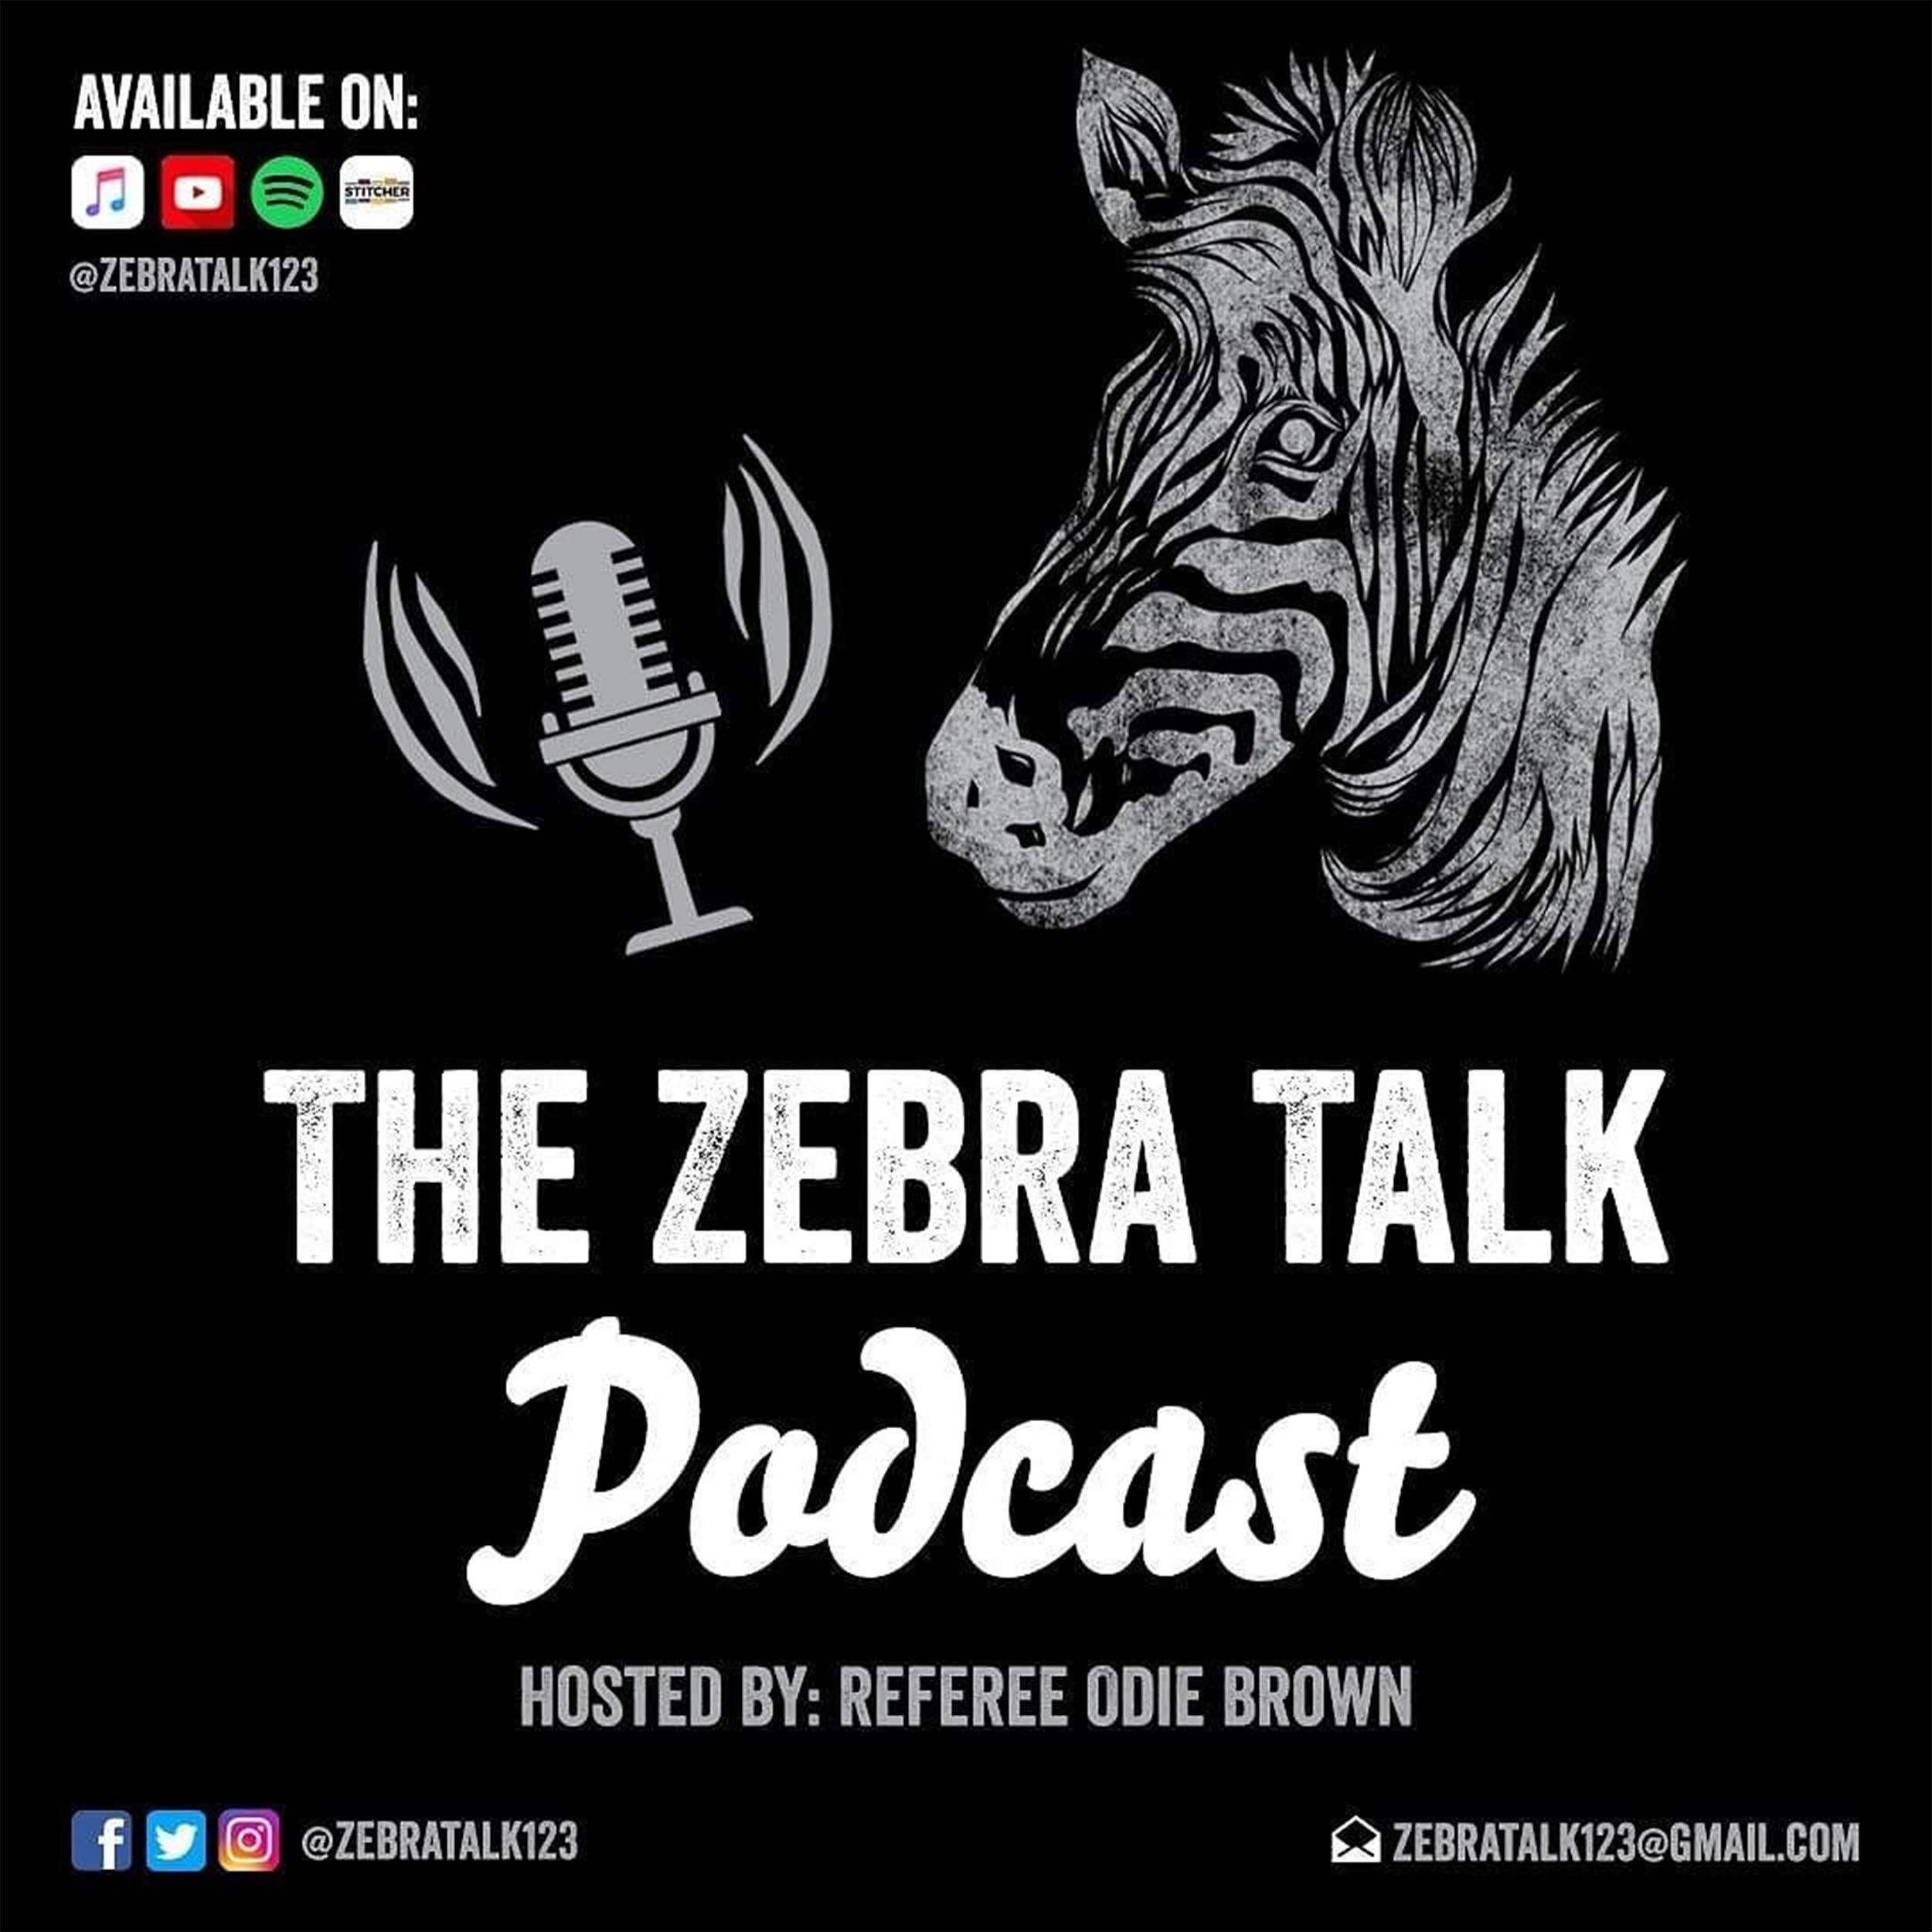 The Zebra Talk Podcast